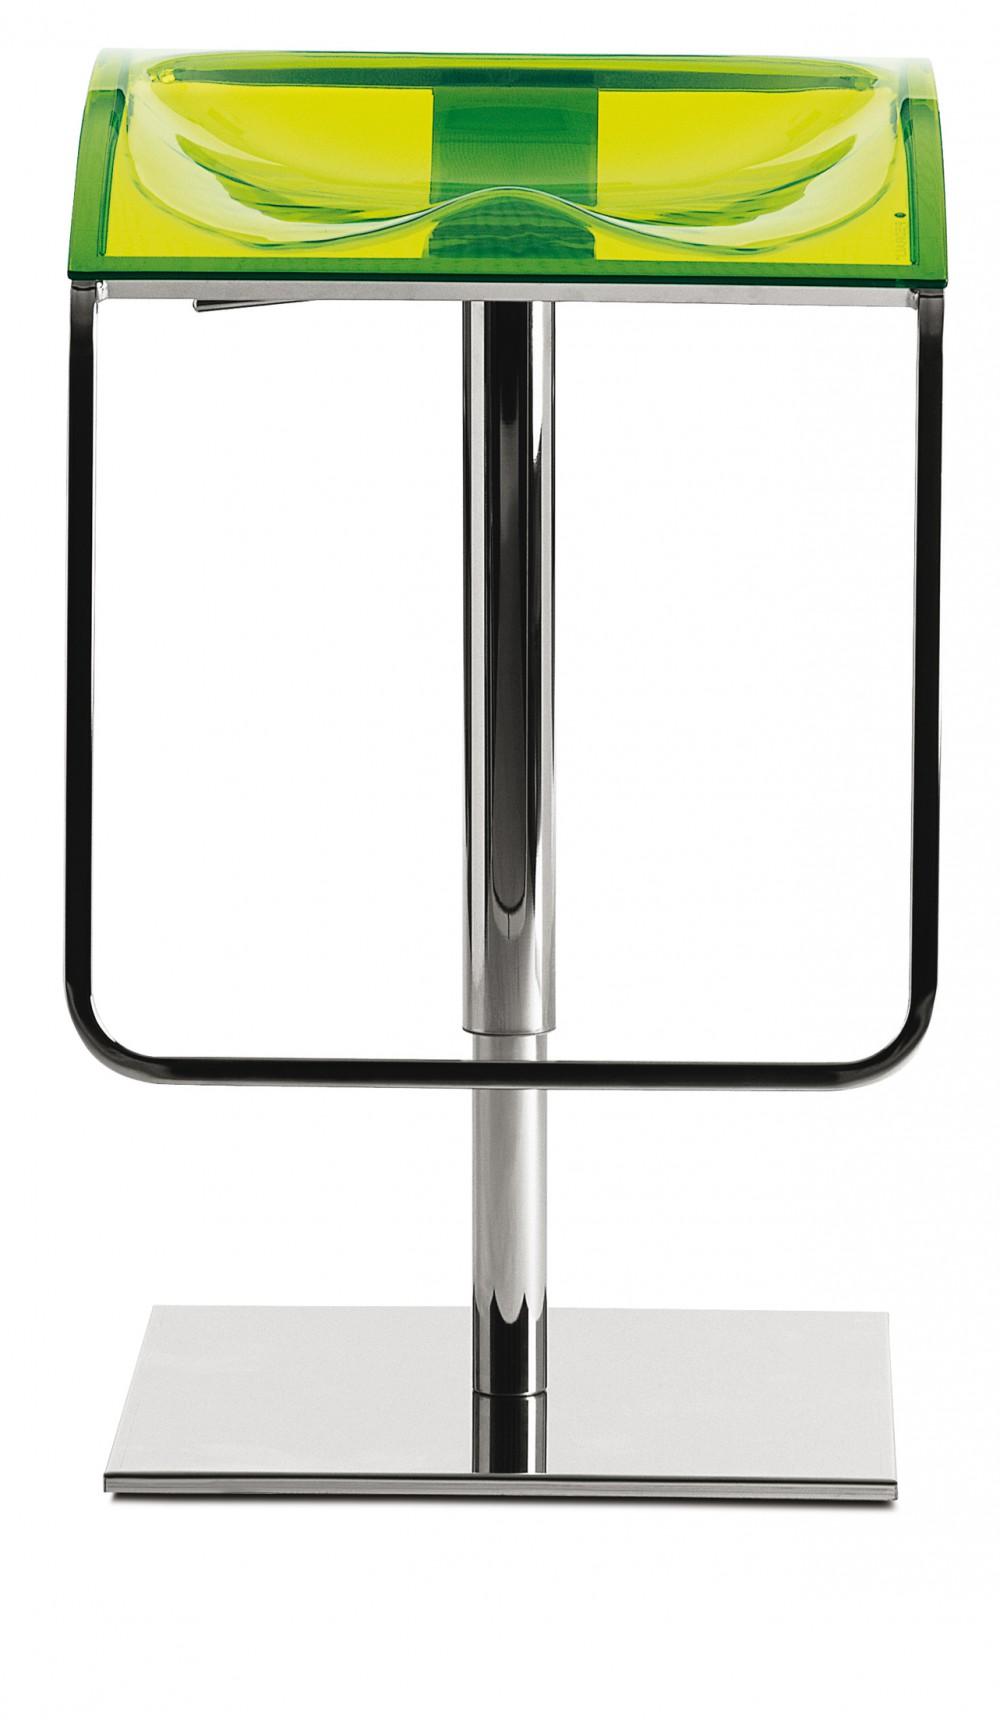 Design Barhocker   Barstühle U0026 Tresenhocker, Hocker   Modern Style   Möbel